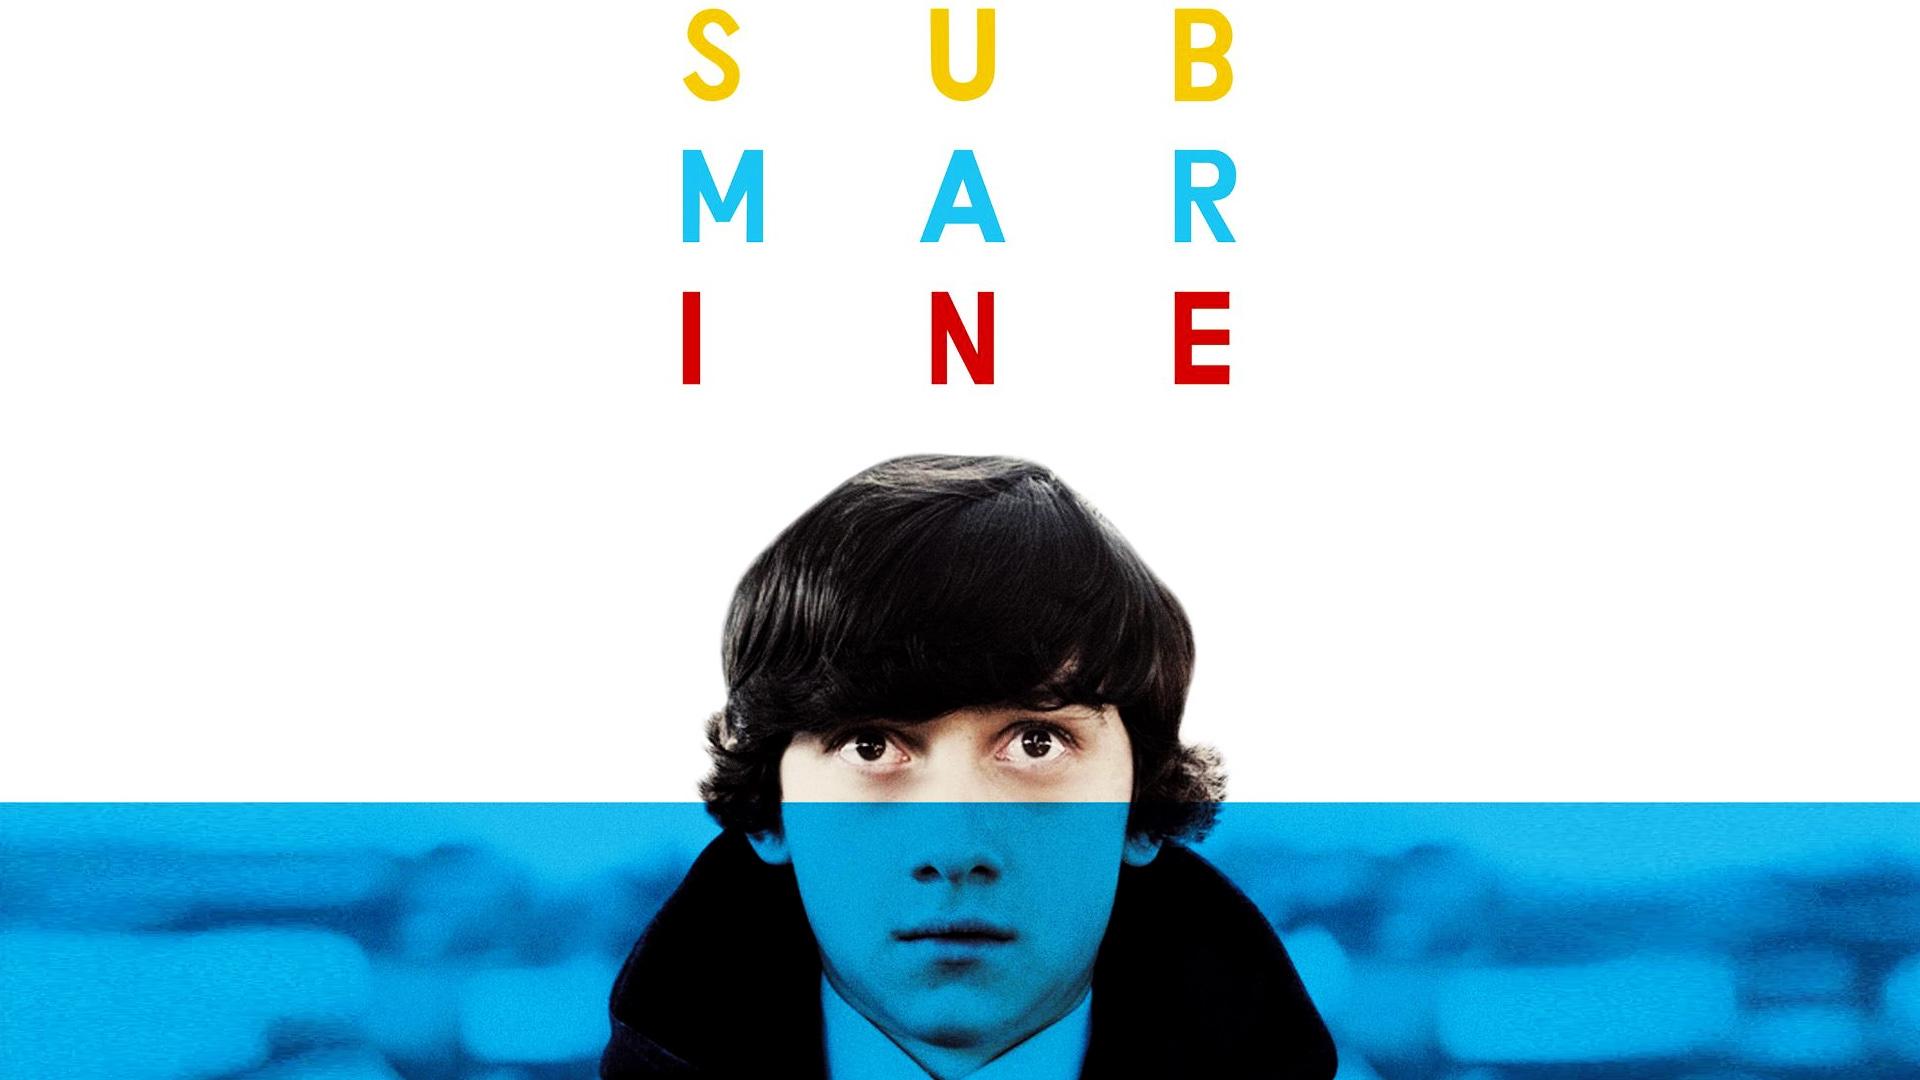 wallpaper-submarine-33640996-1920-1080